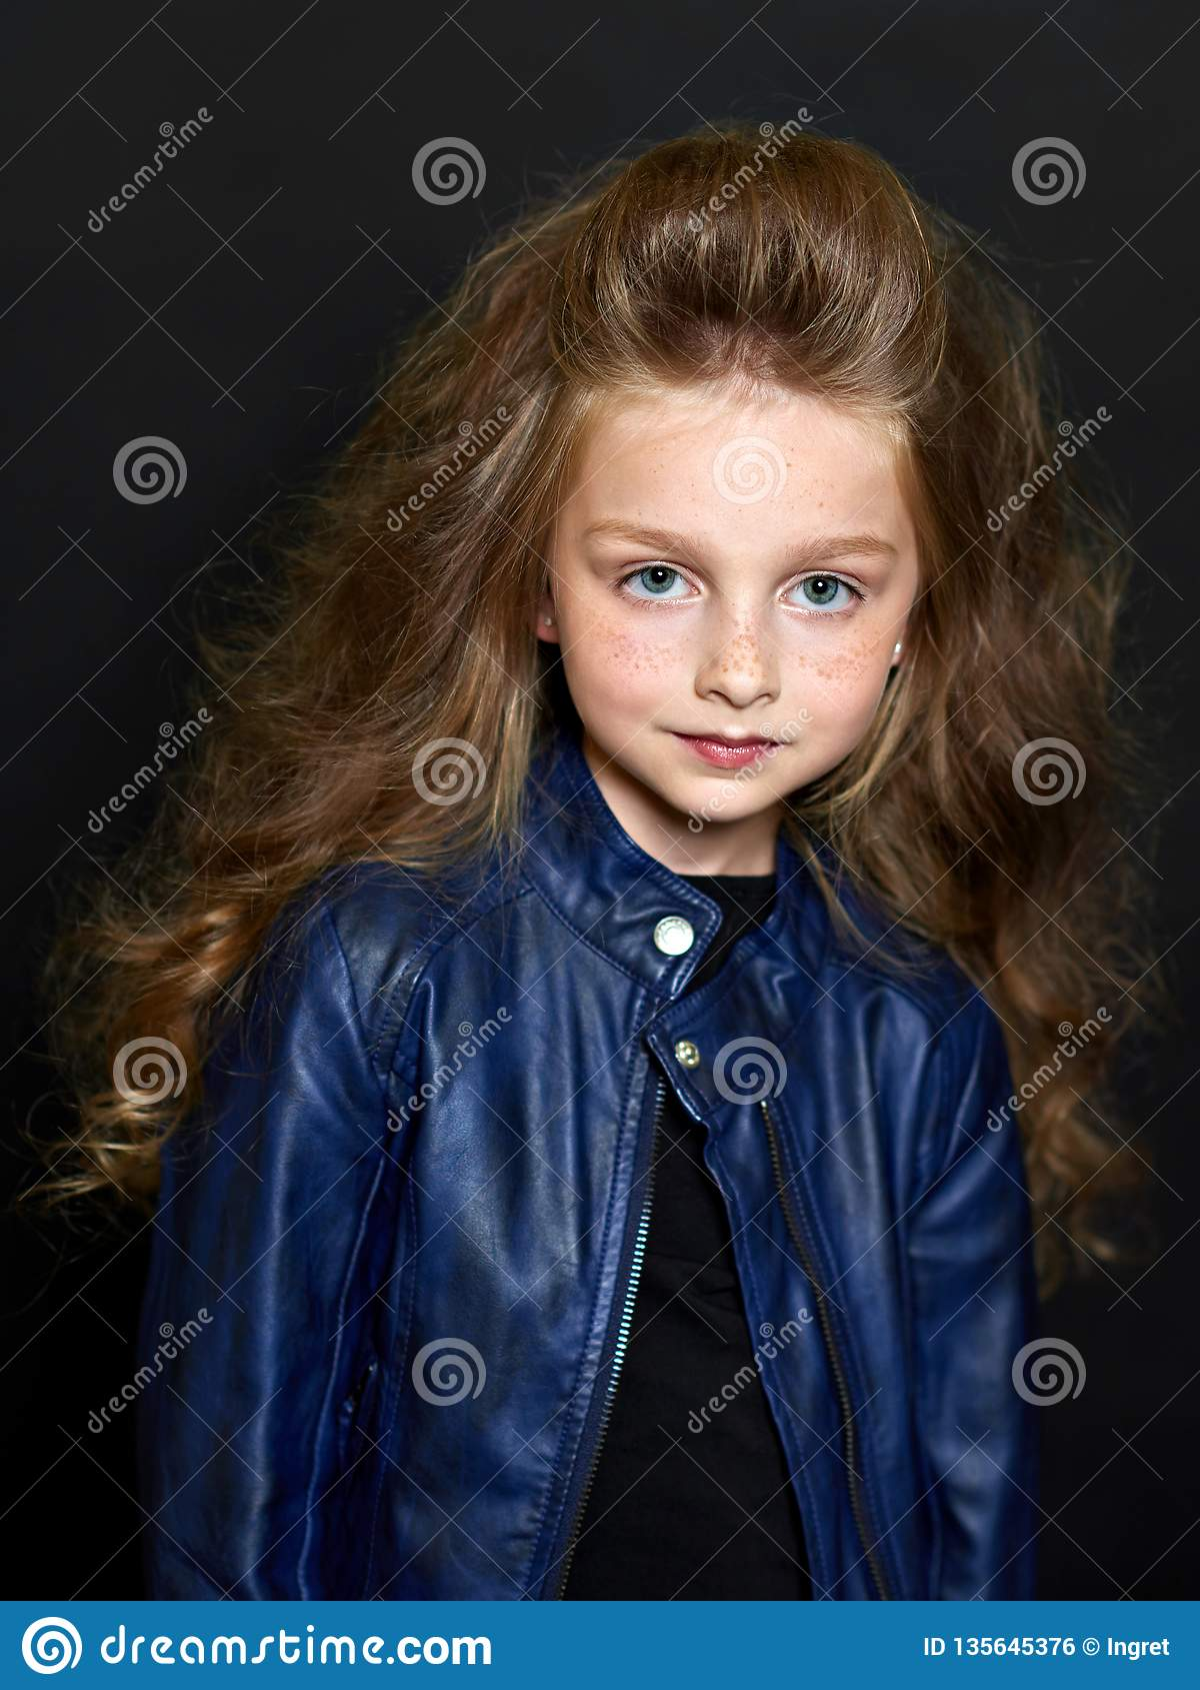 Retrato da criança bonita